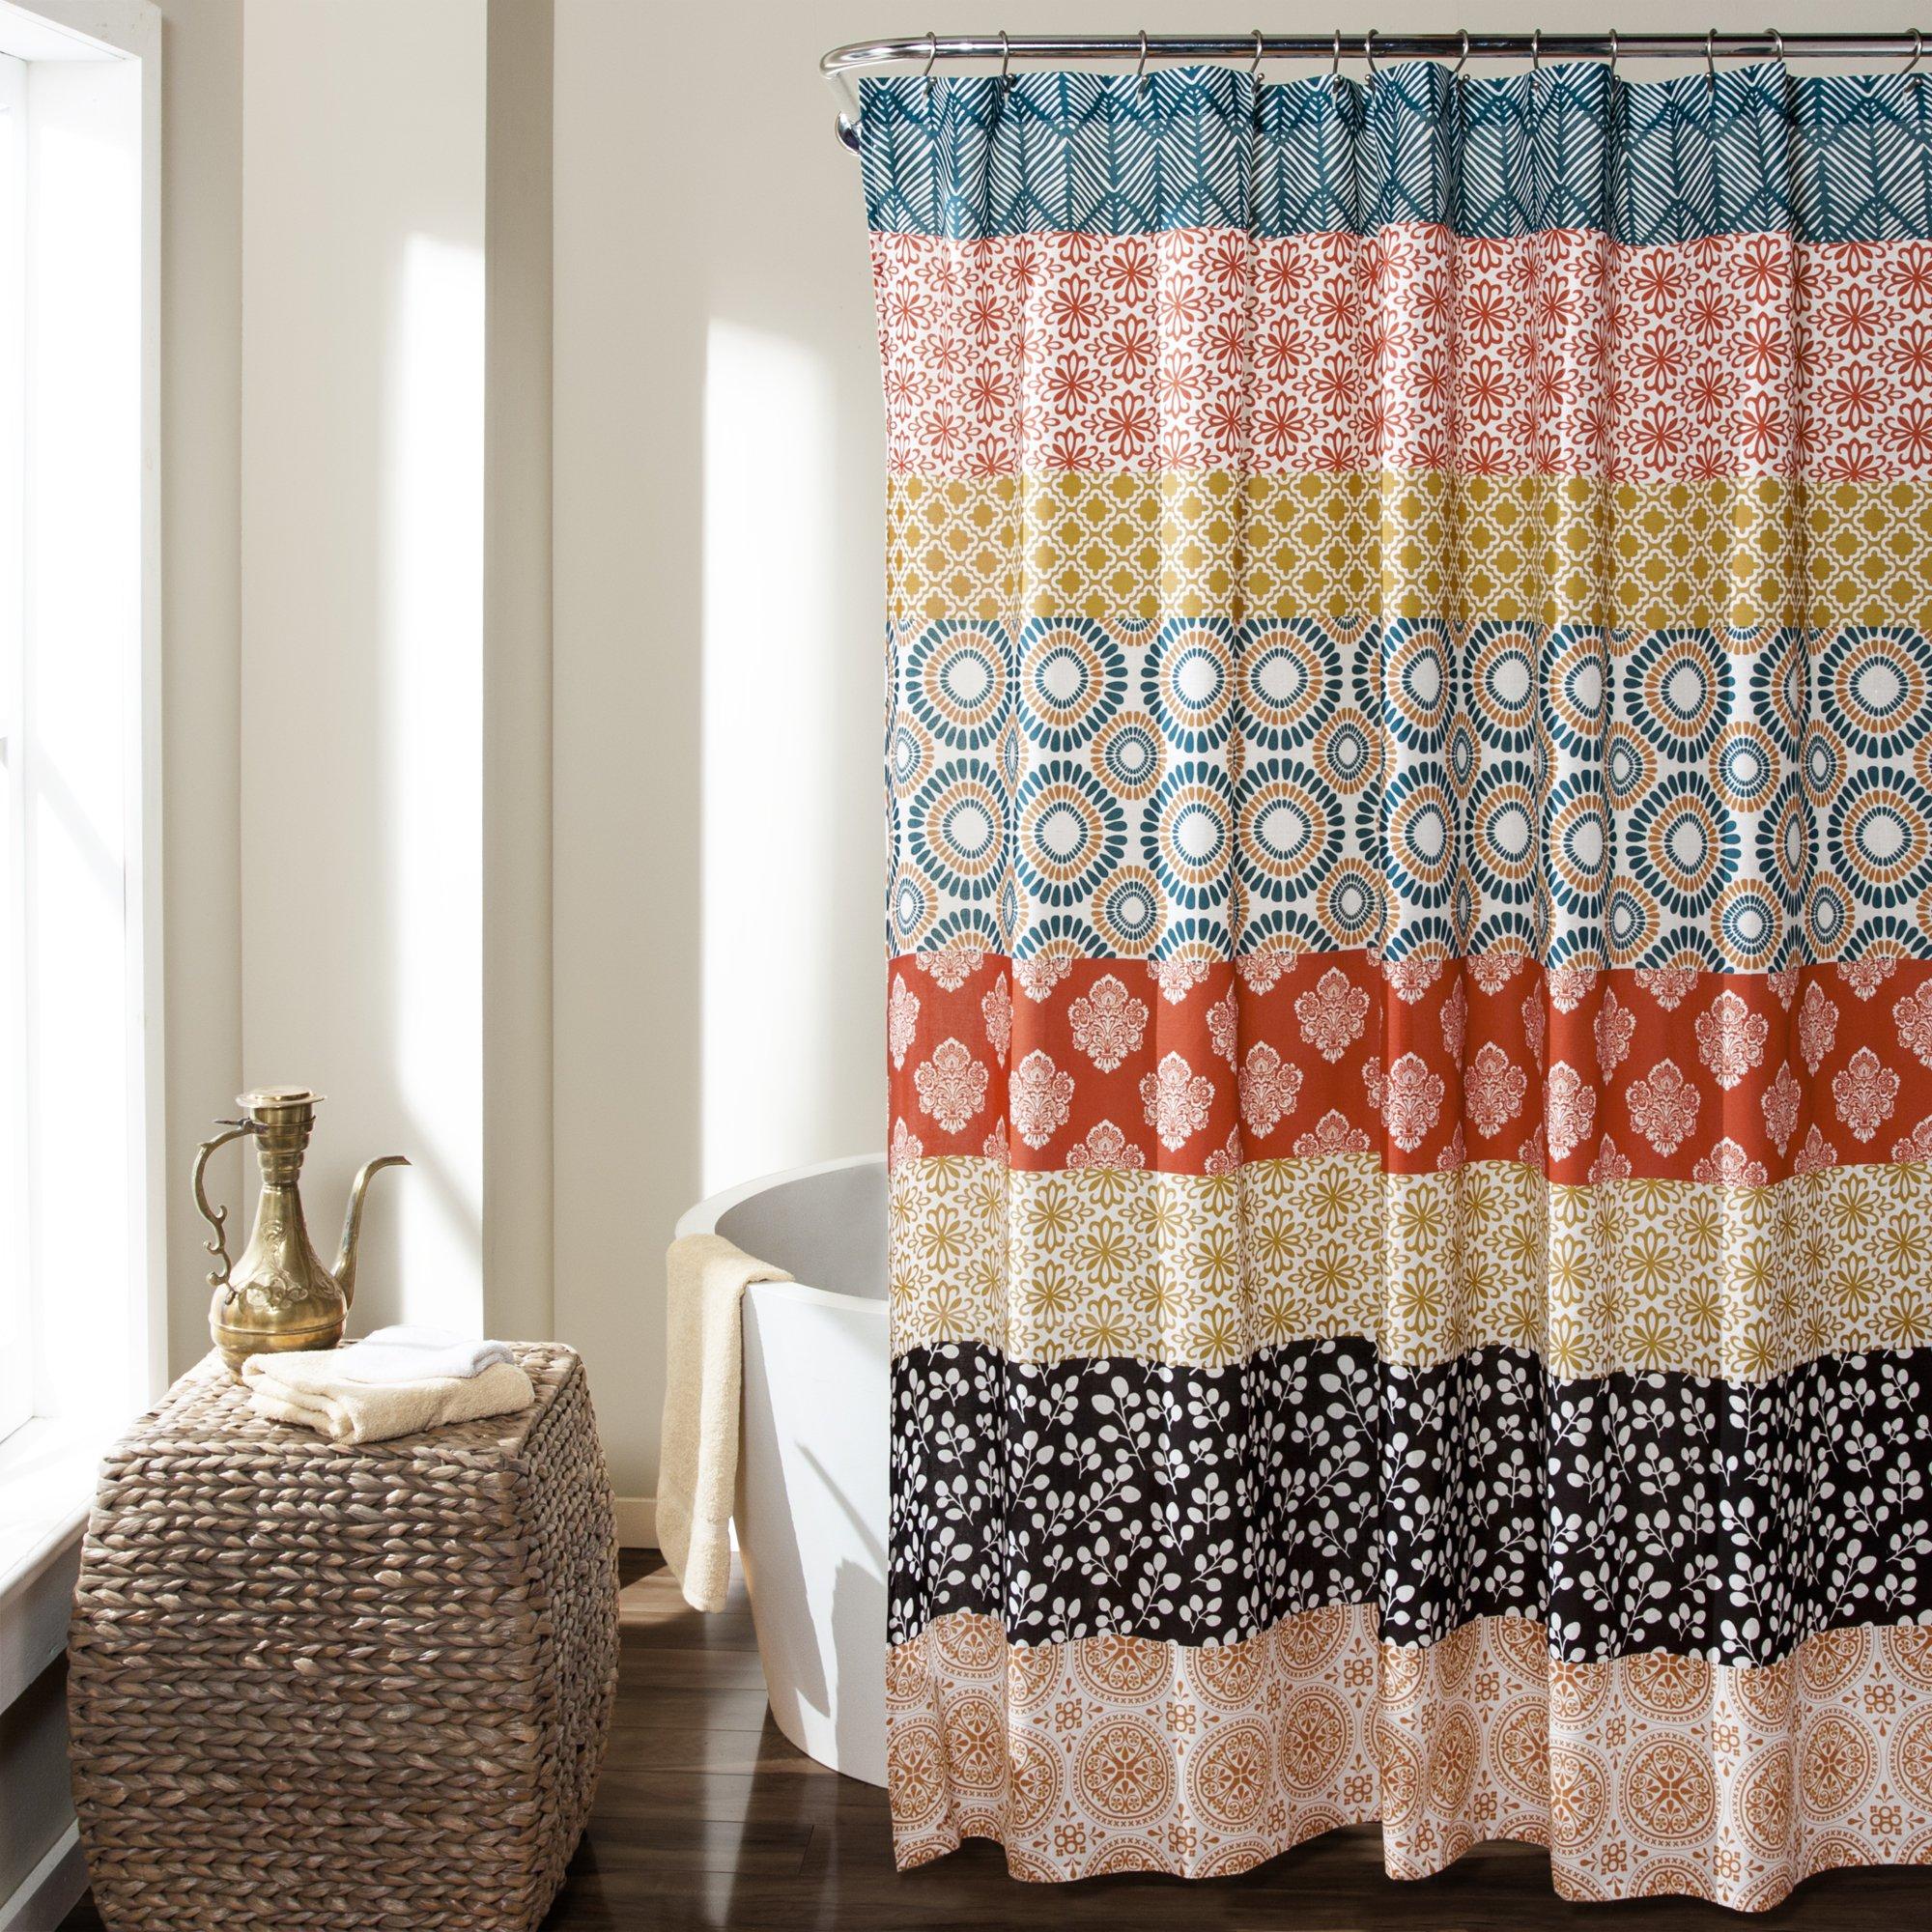 Bohemian Stripe Shower Curtain Turquoise Orange Moroccan Boho Chic Bath Clean